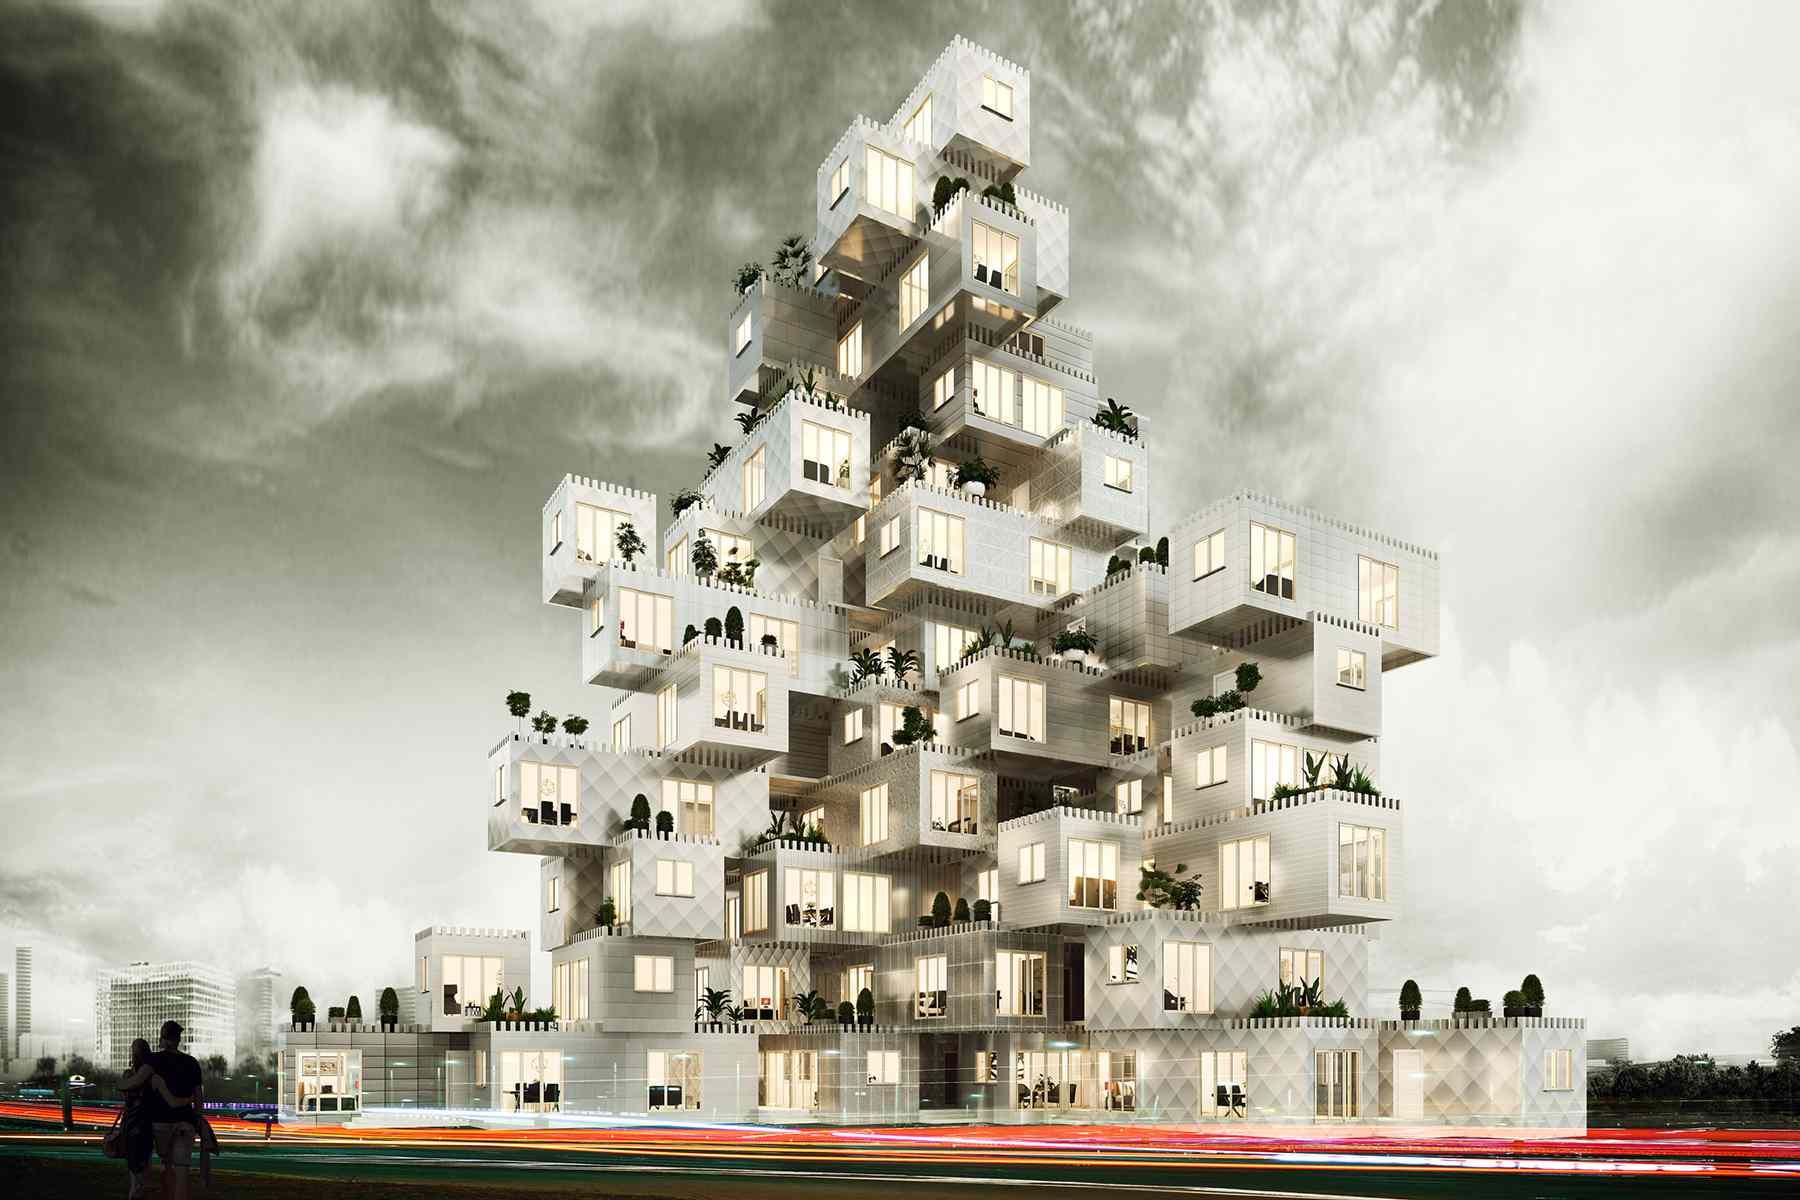 Tetris City